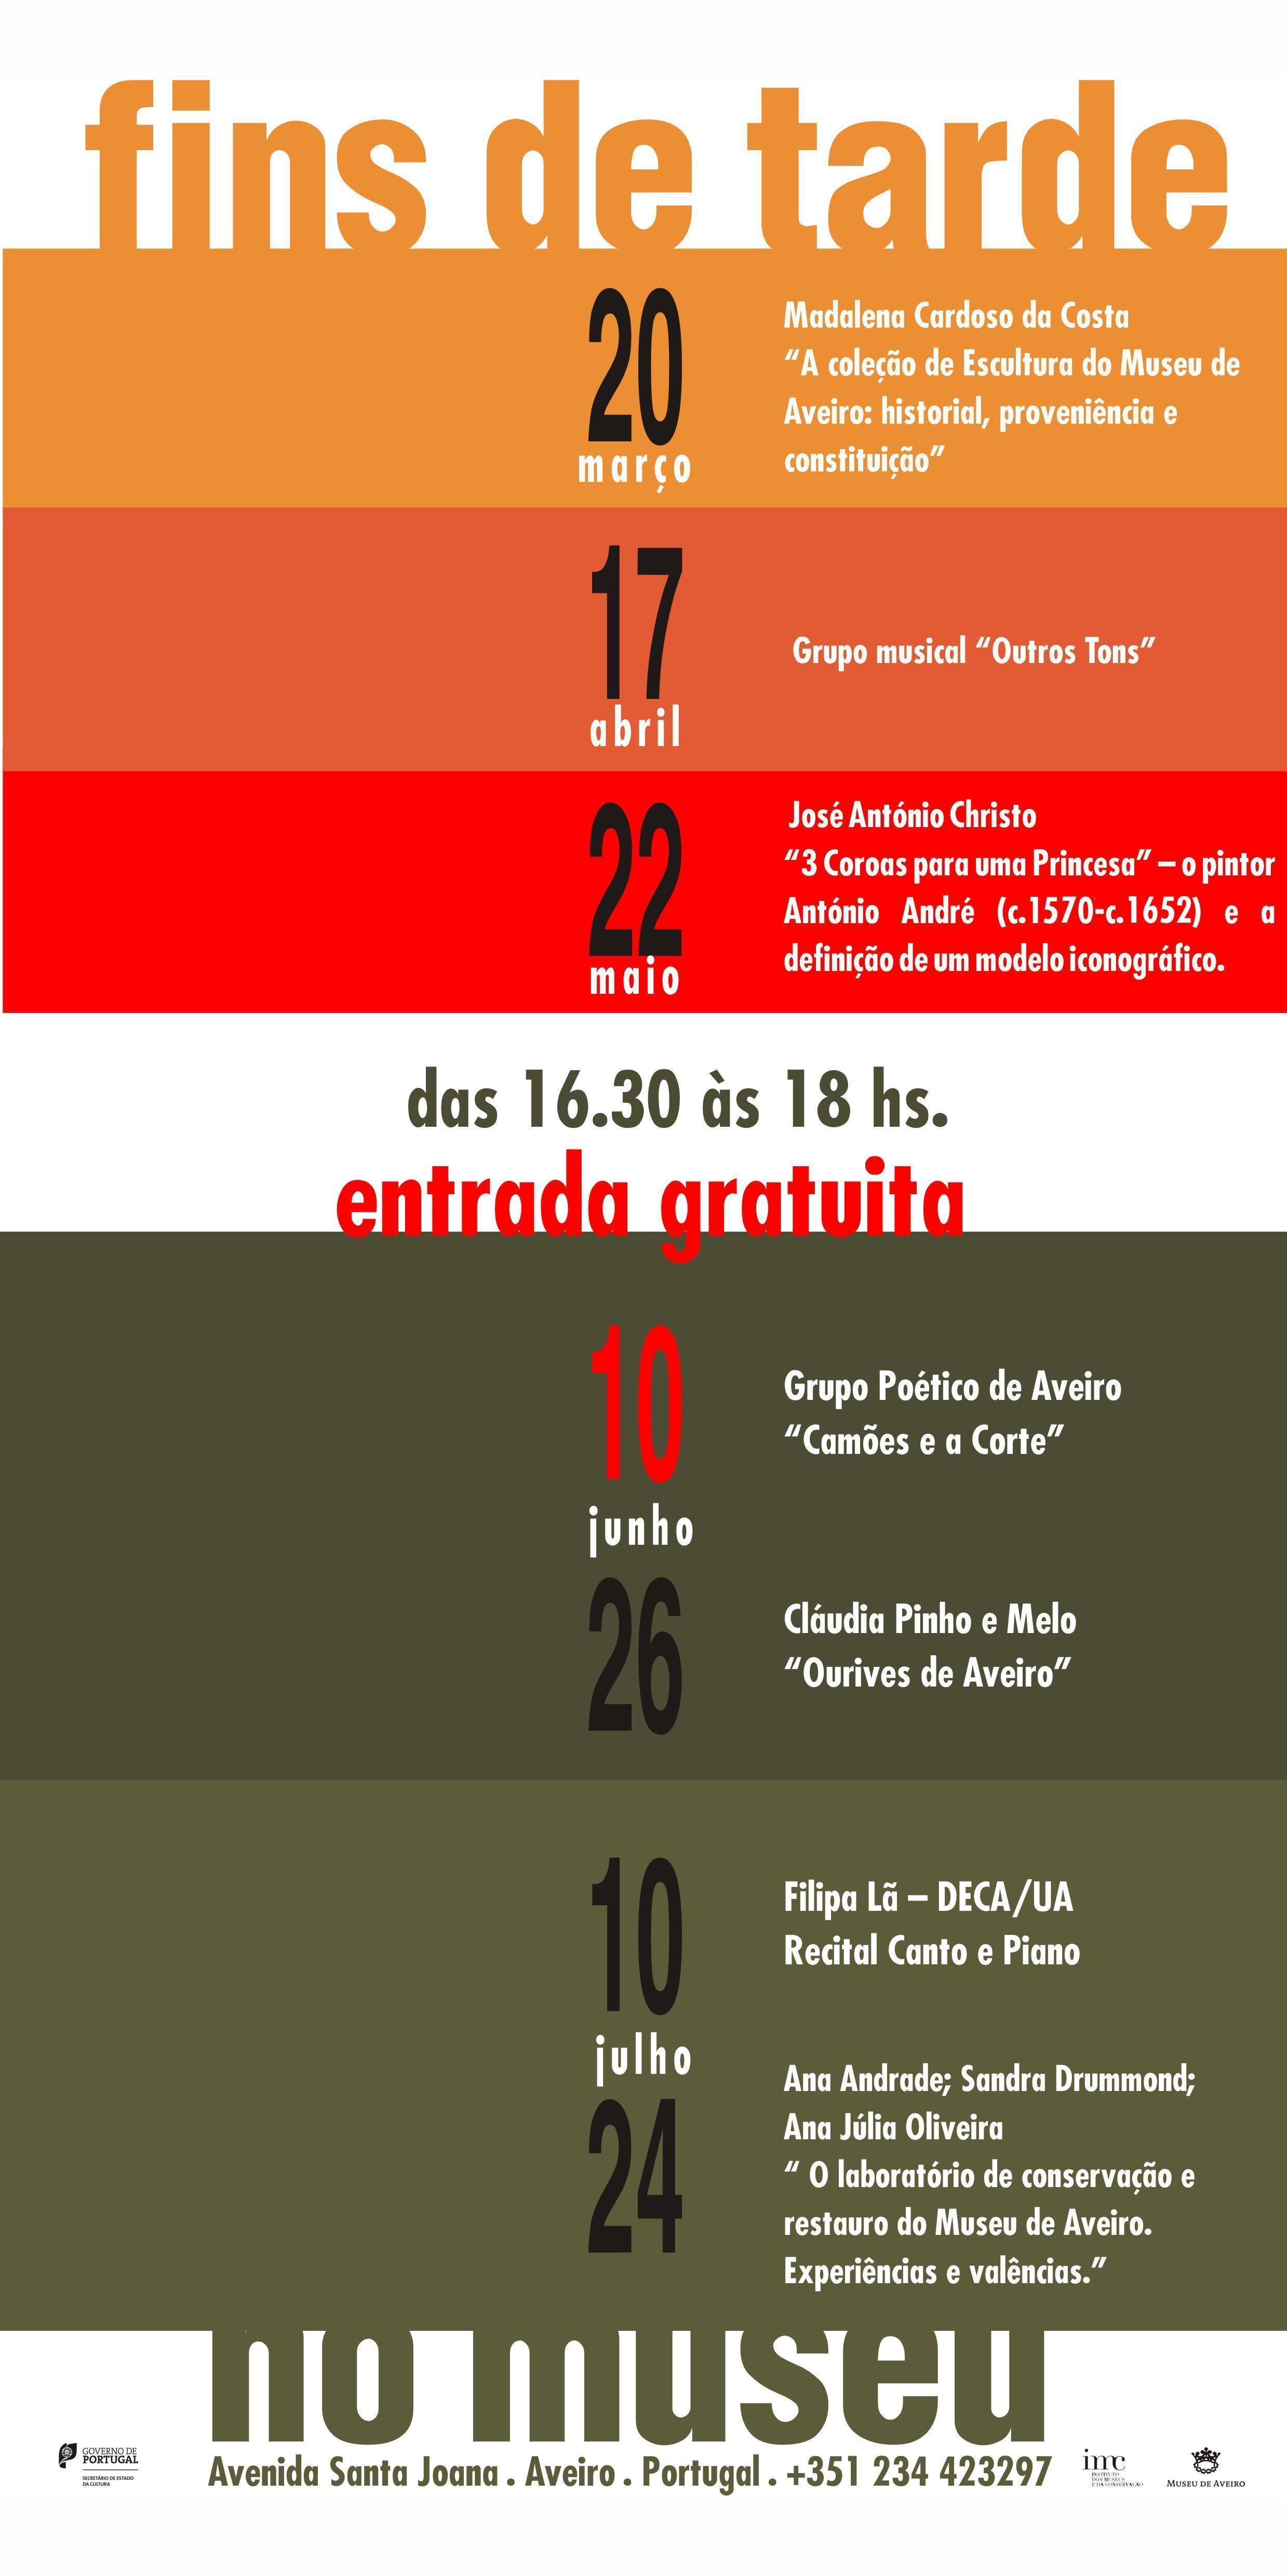 fins_tarde_aveiro